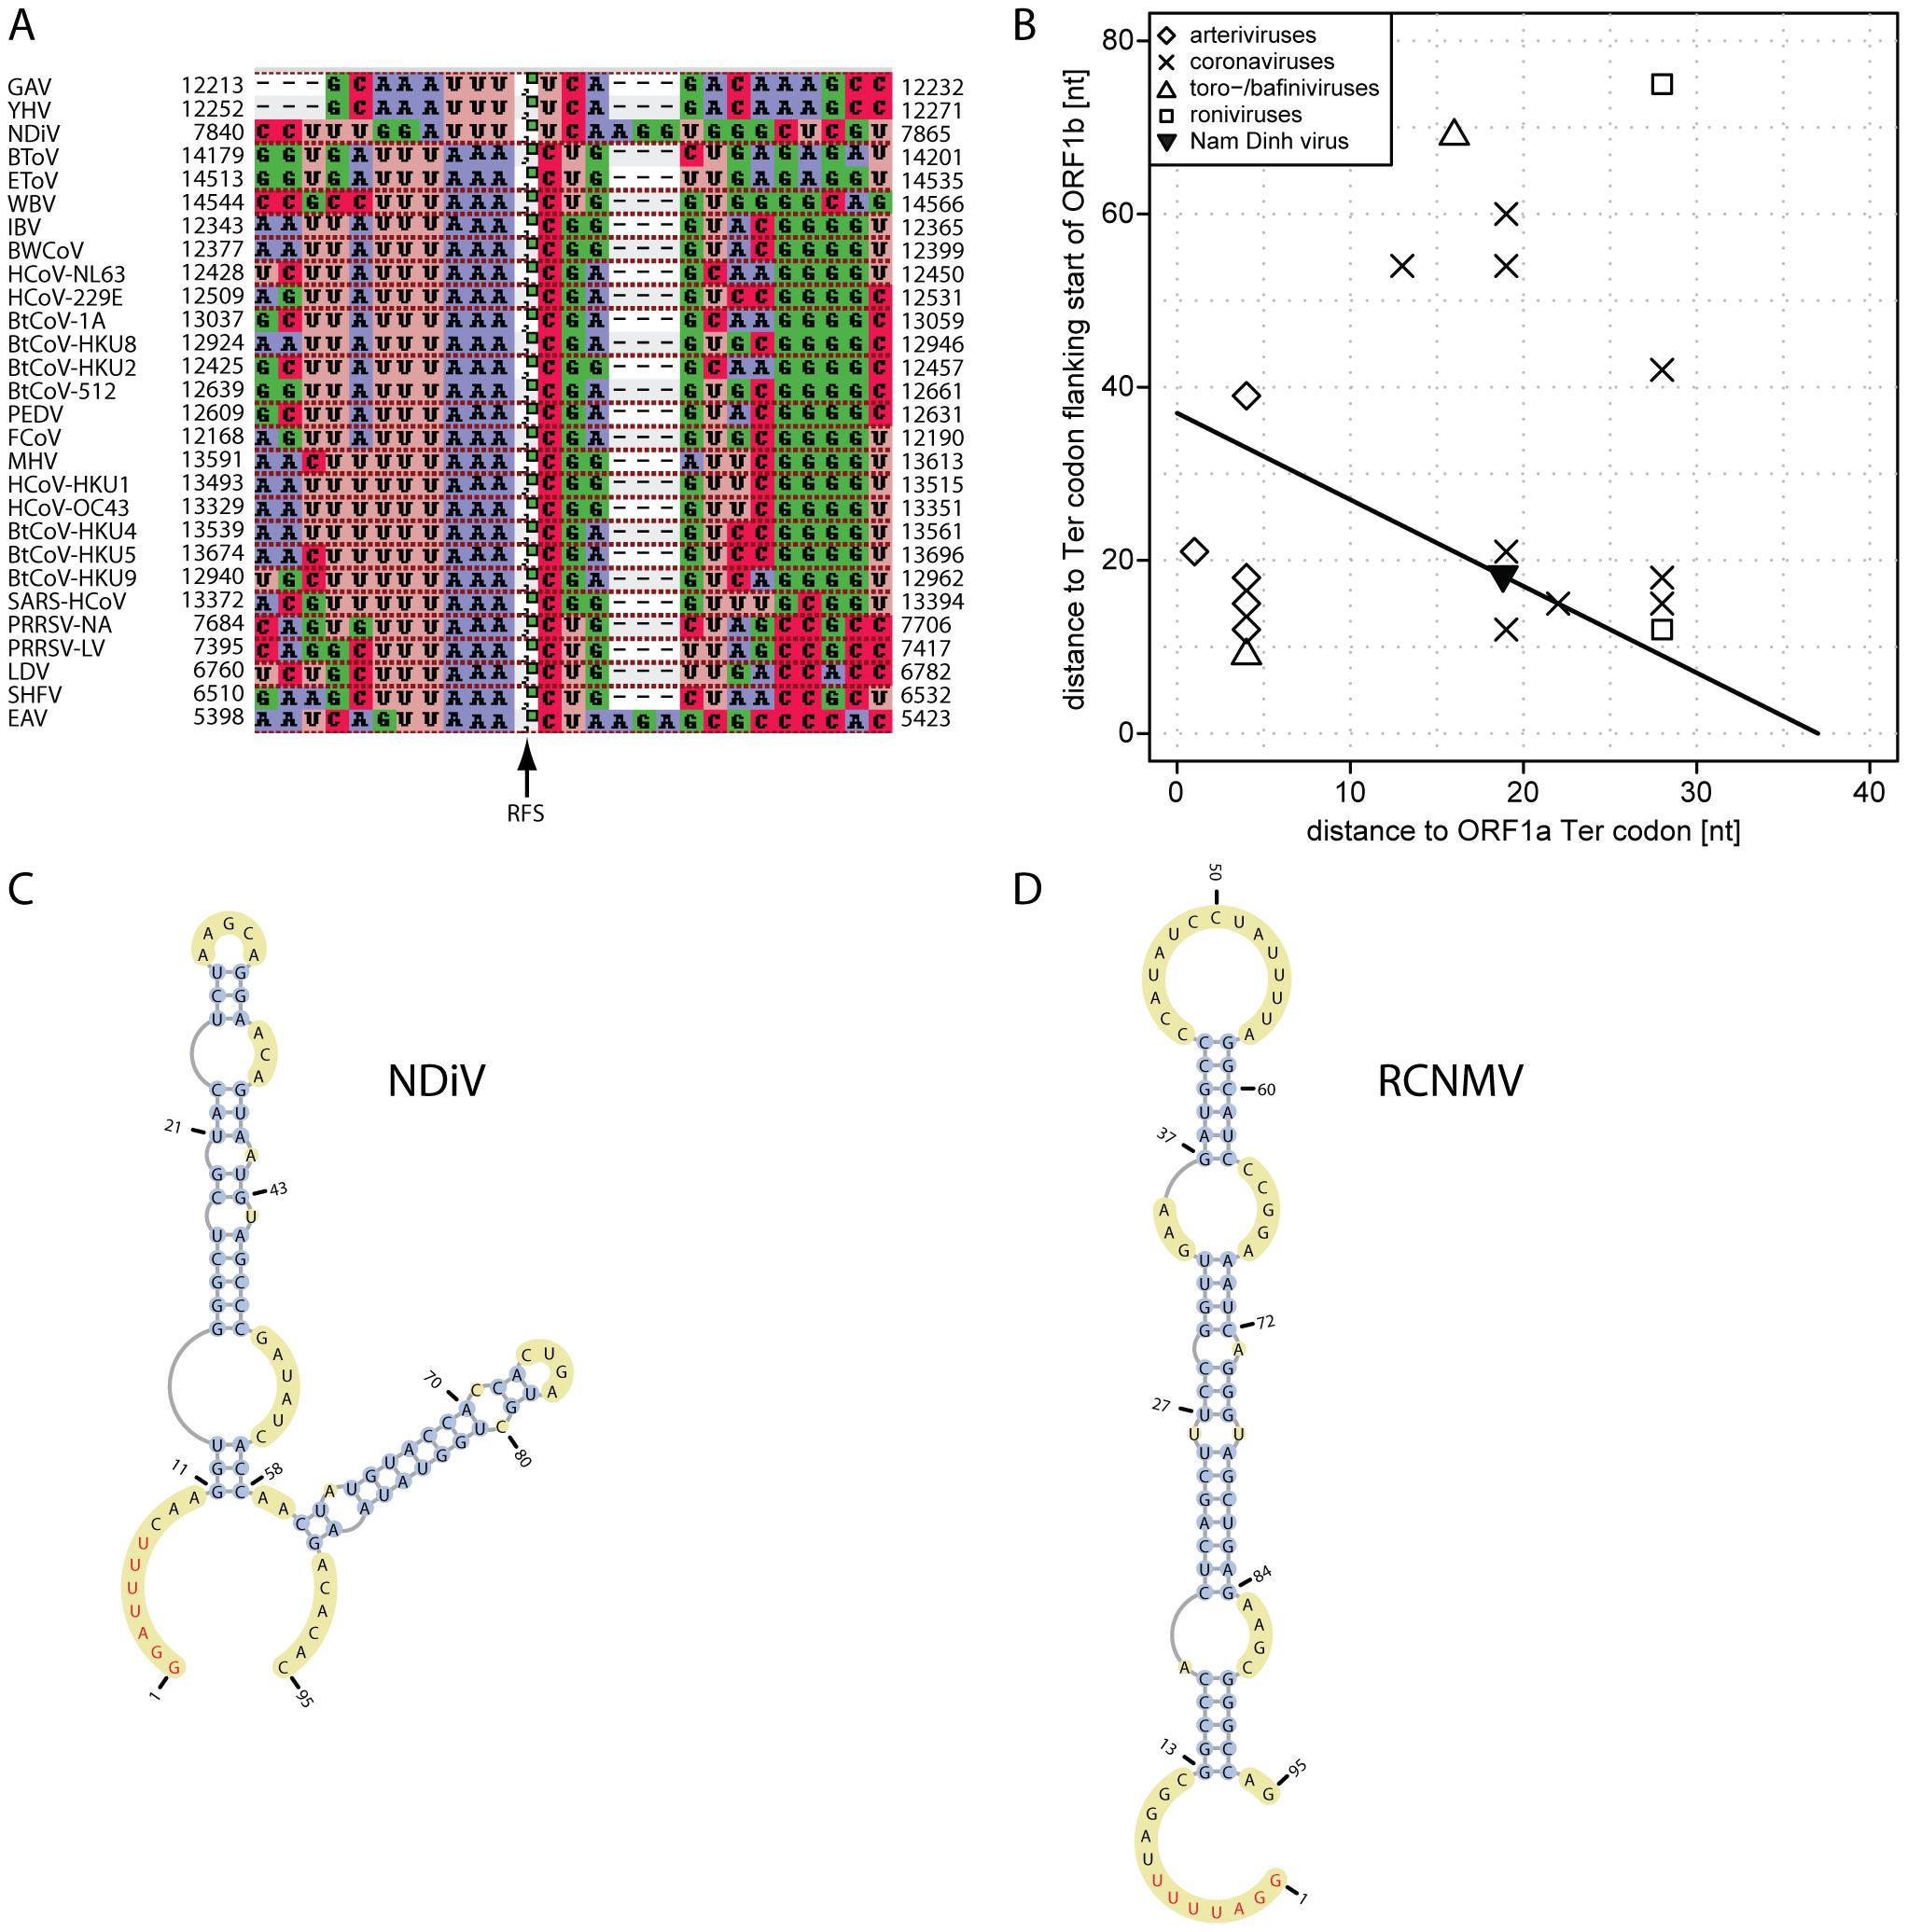 ORF1a/ORF1b ribosomal frameshifting in the NDiV genome.